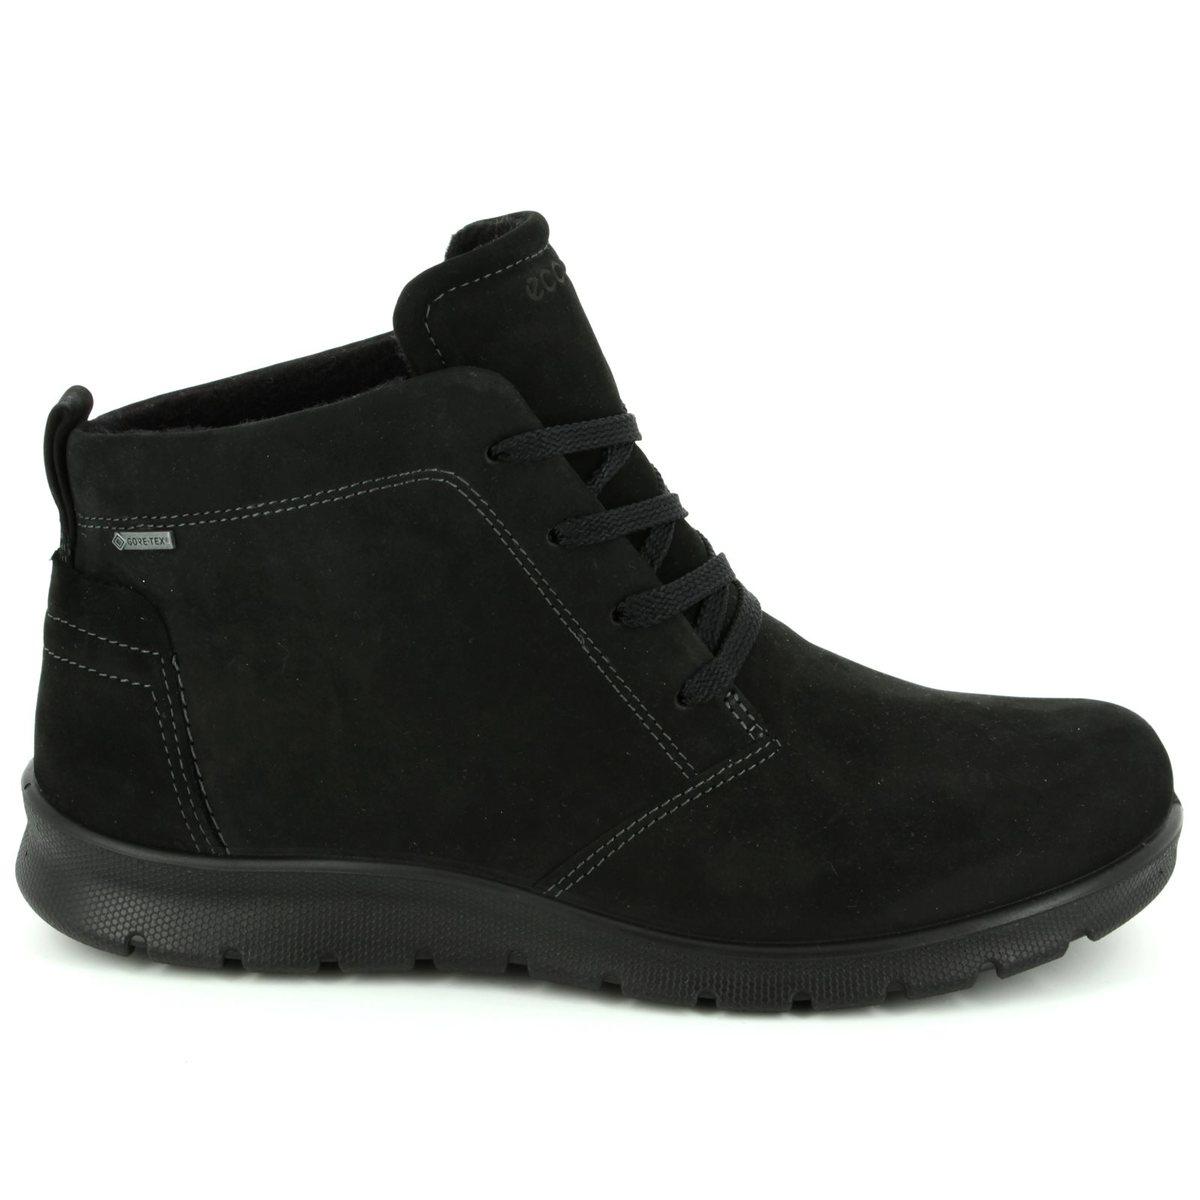 Womens Clarks Gore Tex Walking Shoes